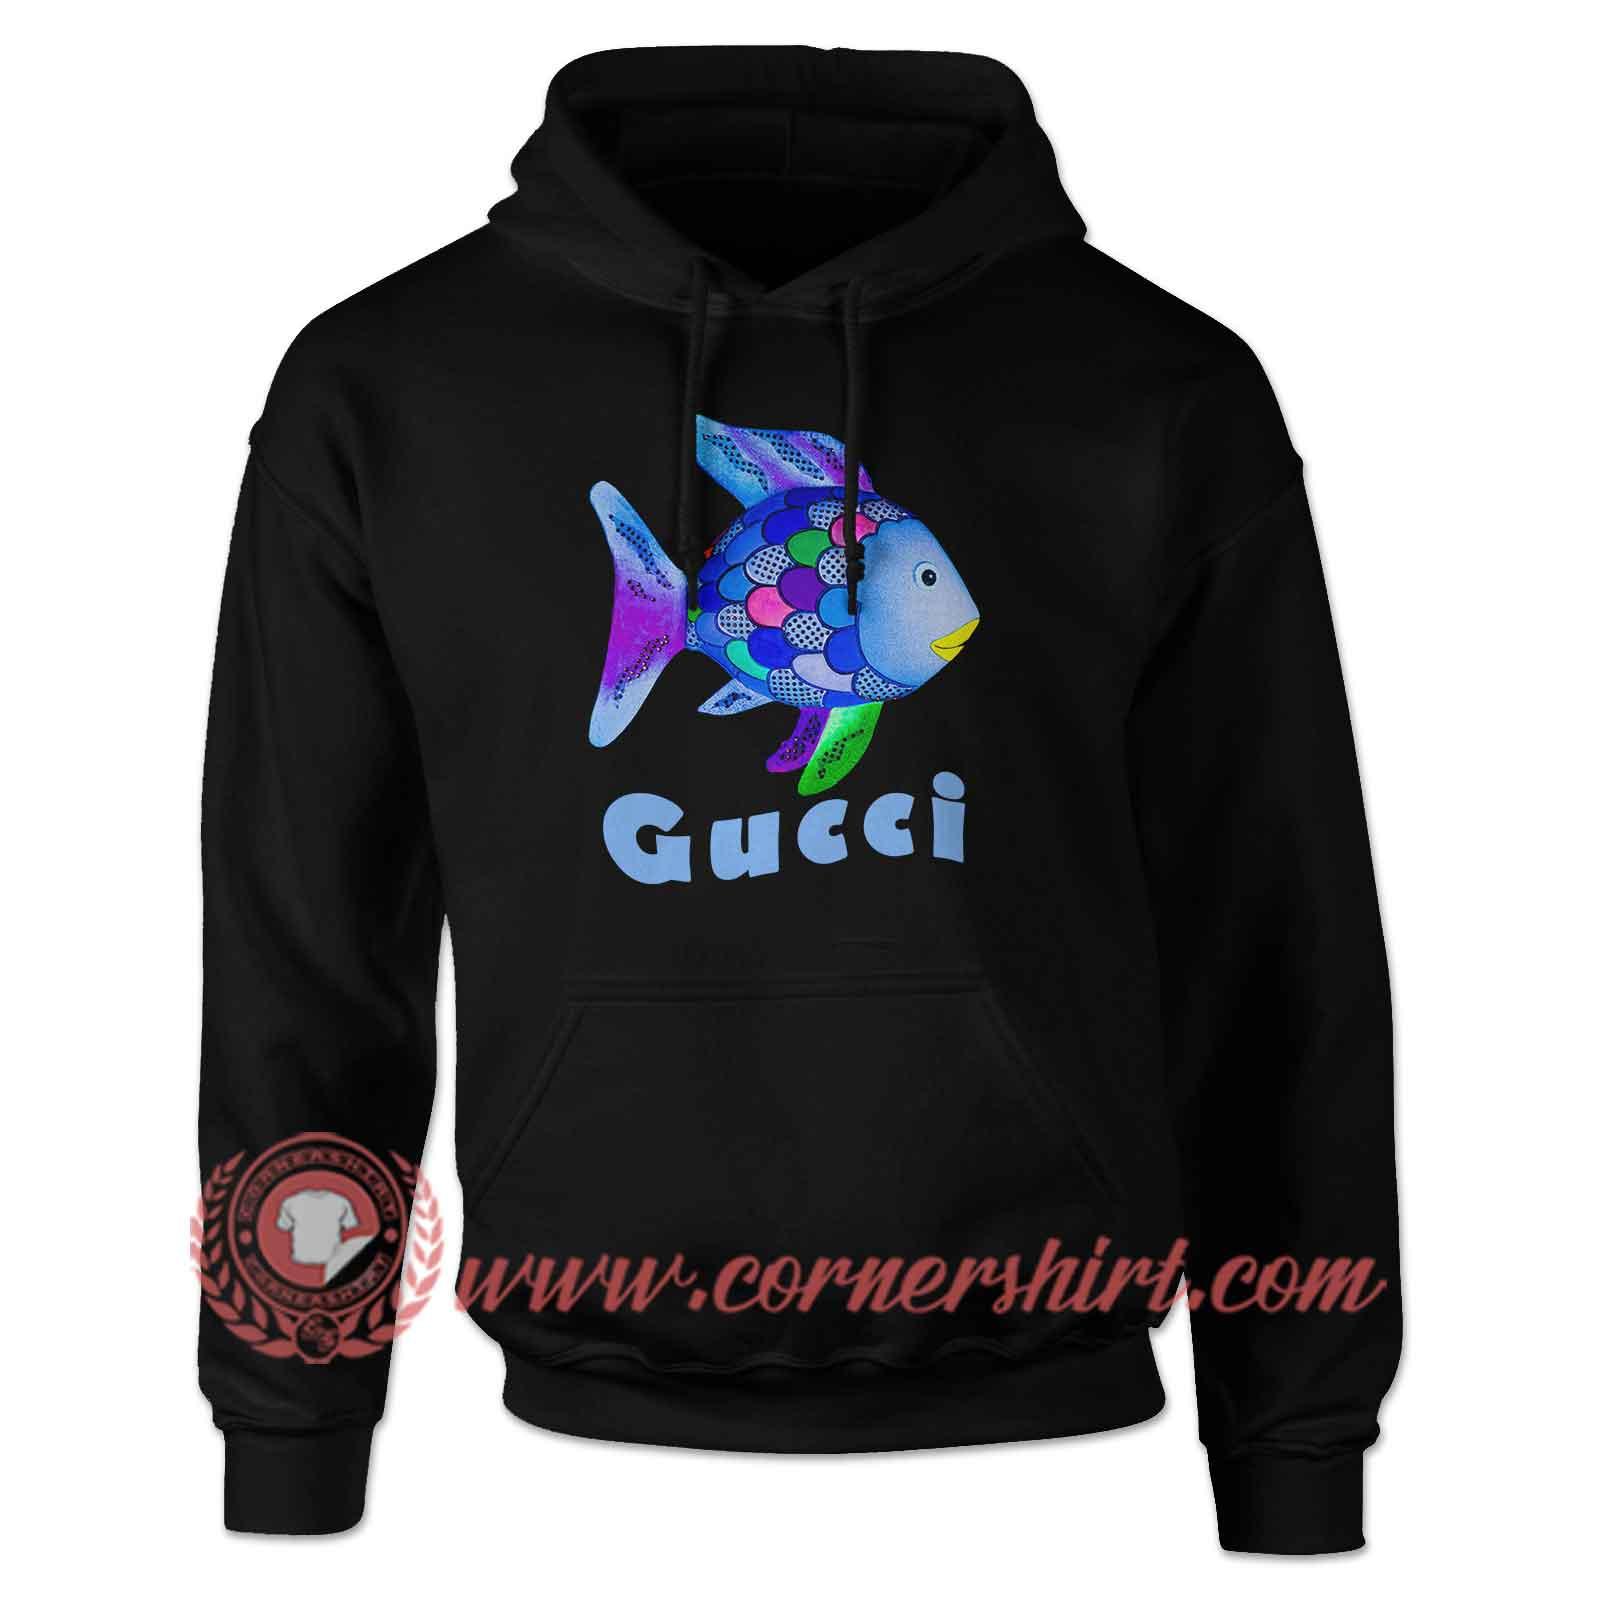 9ba2d5a40c3c Rainbow Fish Gucci Hoodie - Custom Shirt Design - cornershirt.com